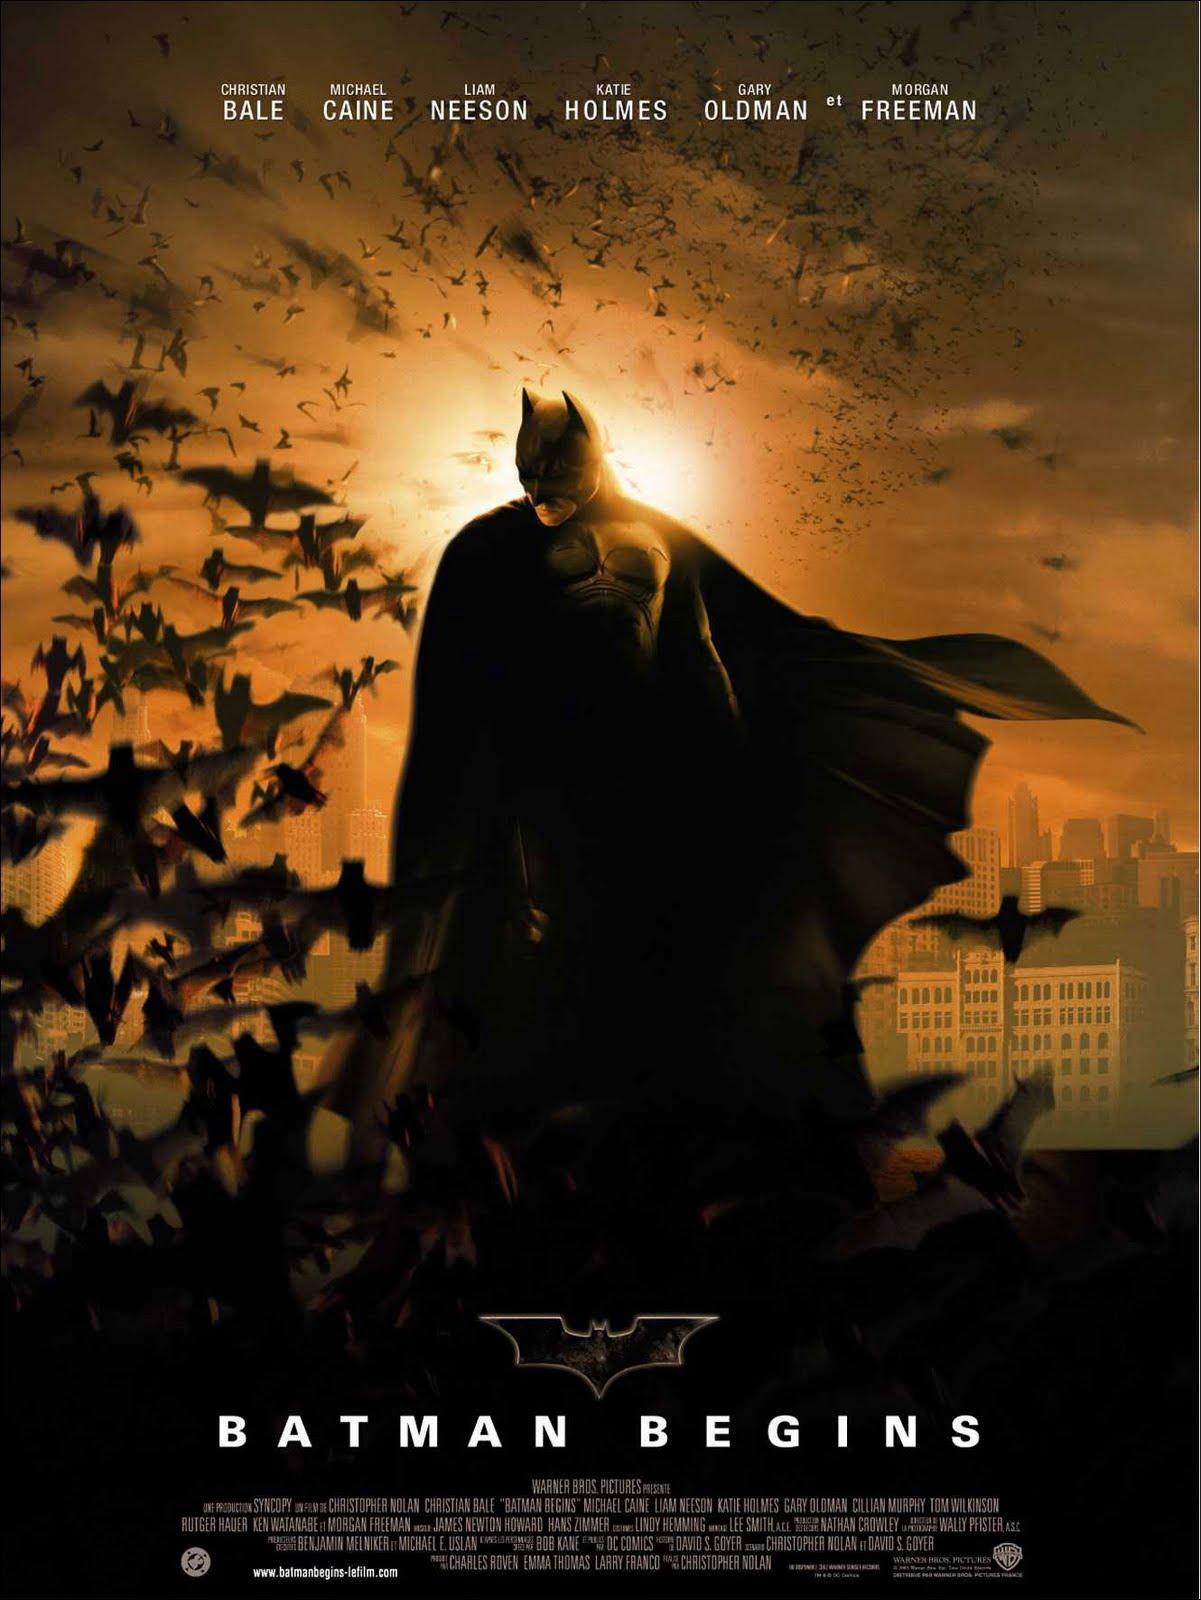 http://4.bp.blogspot.com/_Hcf6GWvO16I/TMkEOuUOPQI/AAAAAAAAAPc/p1GUEjKOgx0/s1600/batman_begins_d.jpg